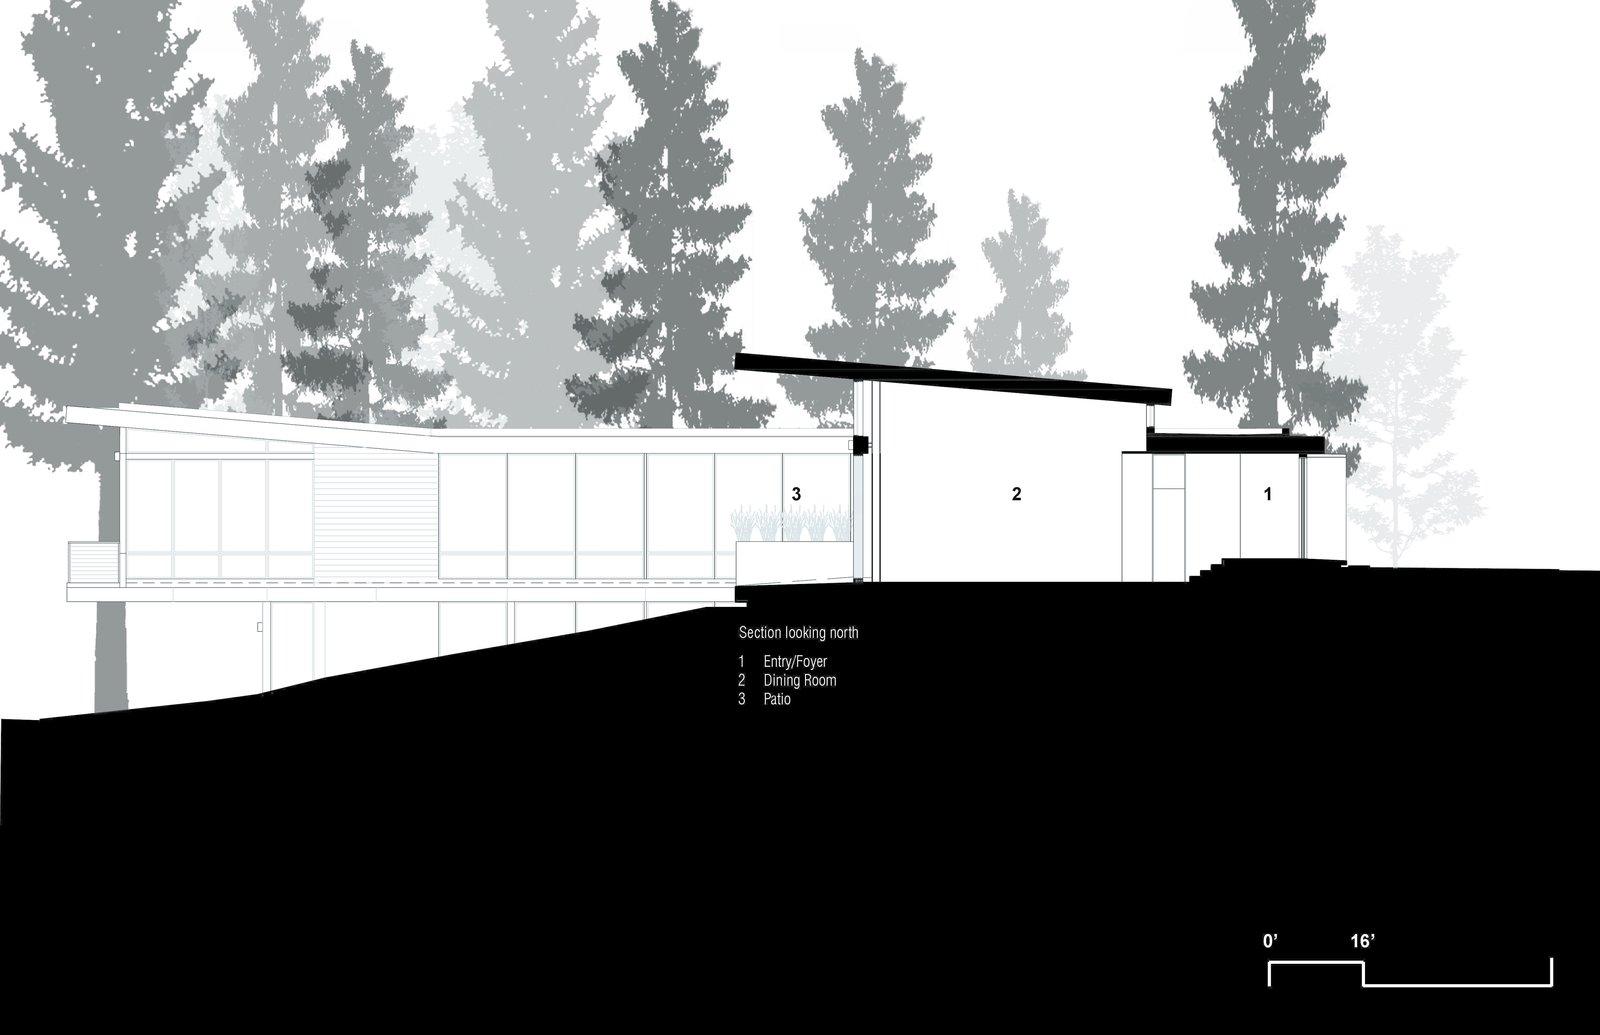 Longitudinal Section  Martis Camp Residence 1 by John Maniscalco Architecture